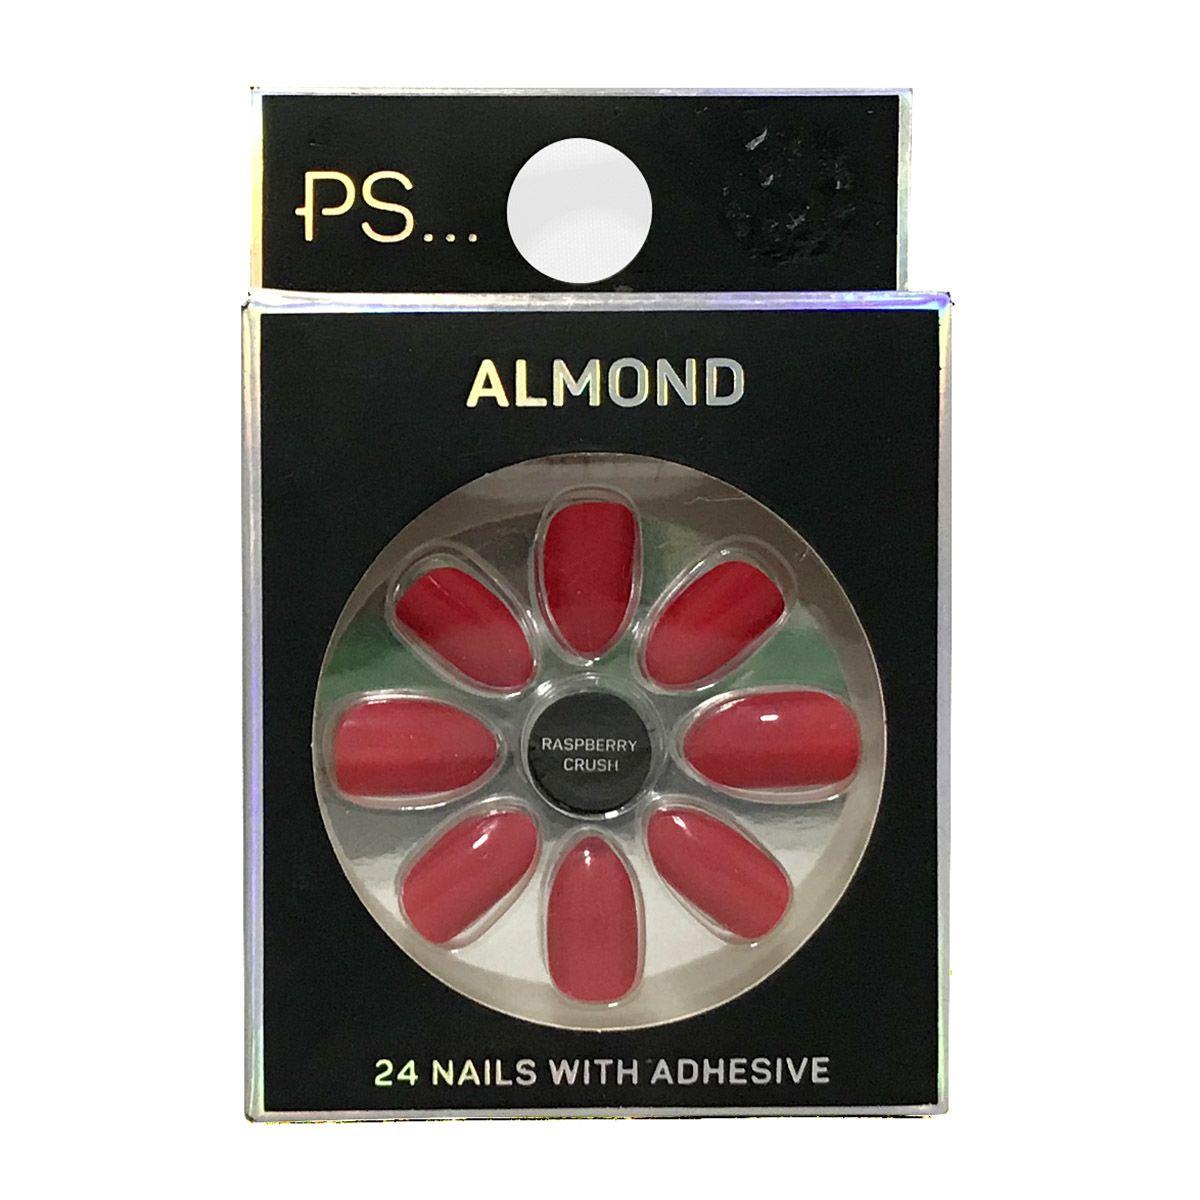 Primark Almond Raspberry Crush 24 Nails With Adhesive